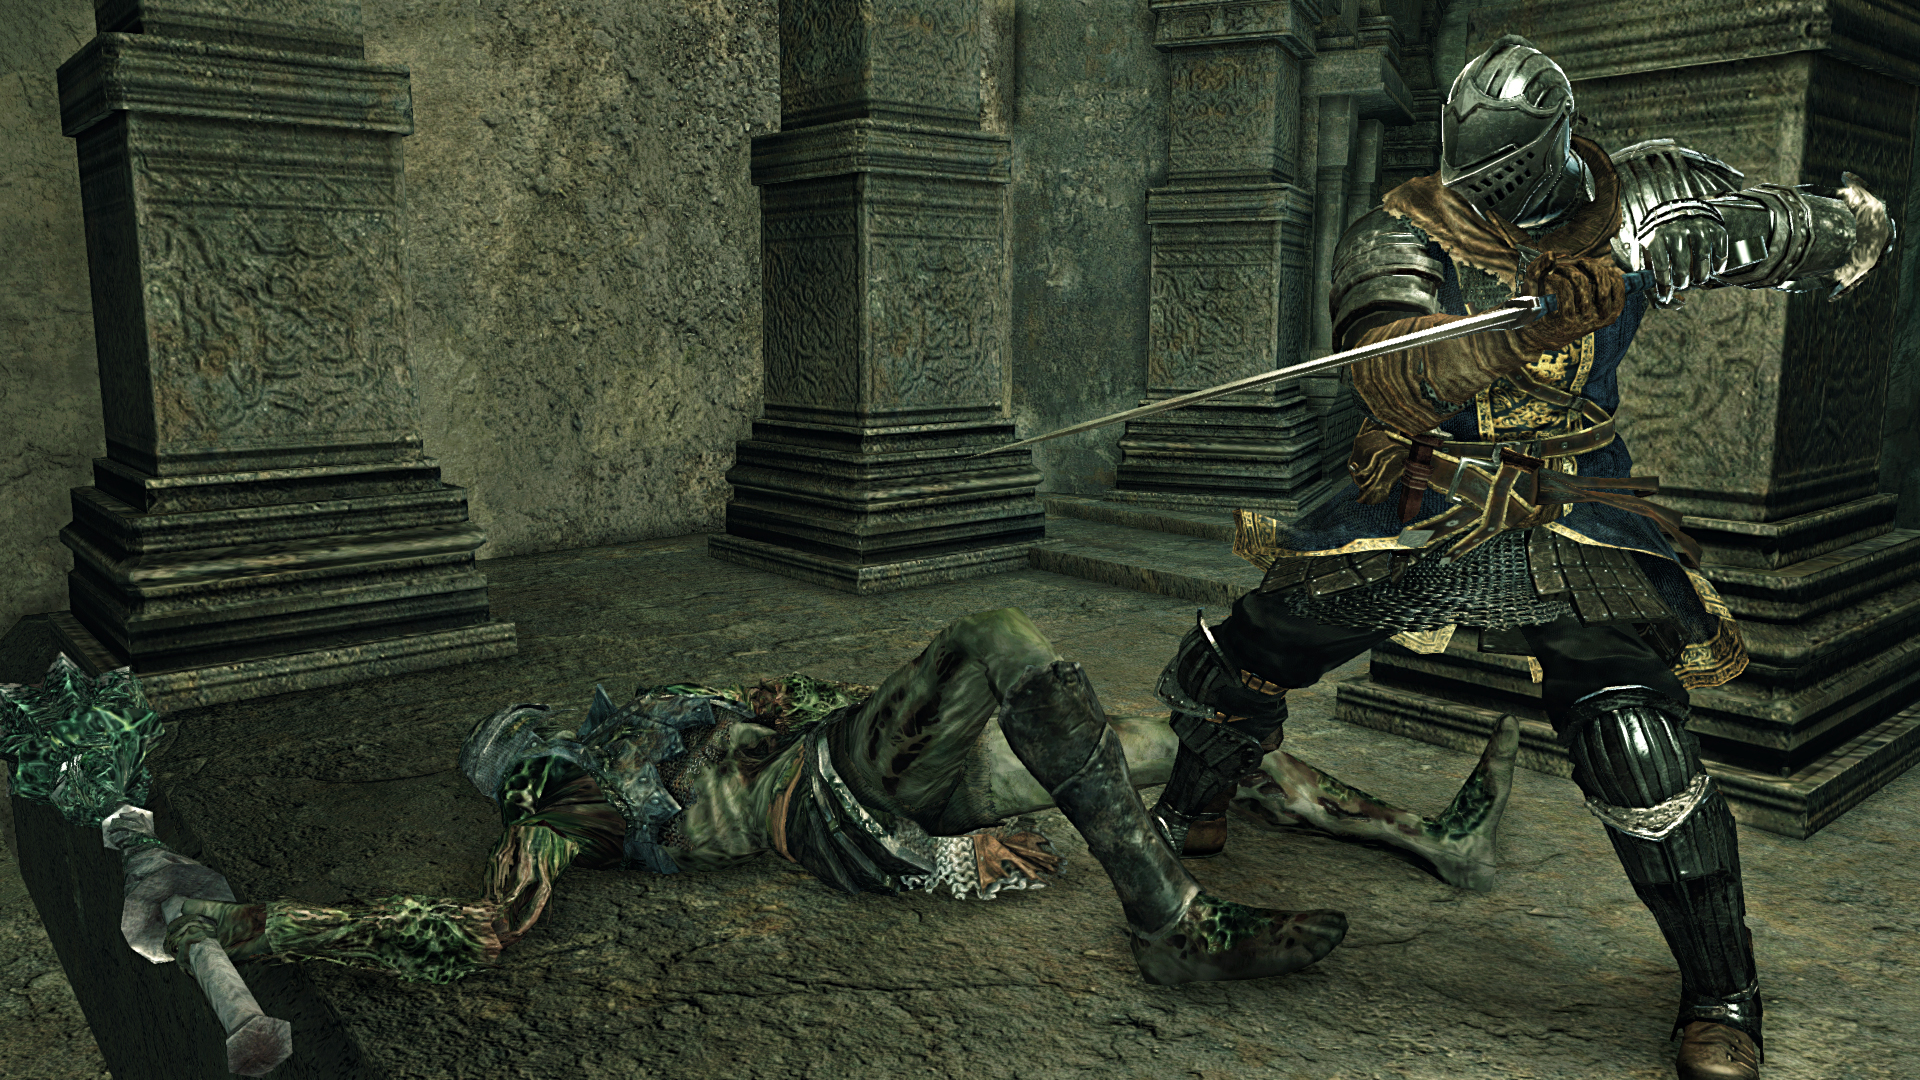 Obrazem: Temné dungeony, kostlivci a monstra z Dark Souls 2: Scholar of the First Sin 107555